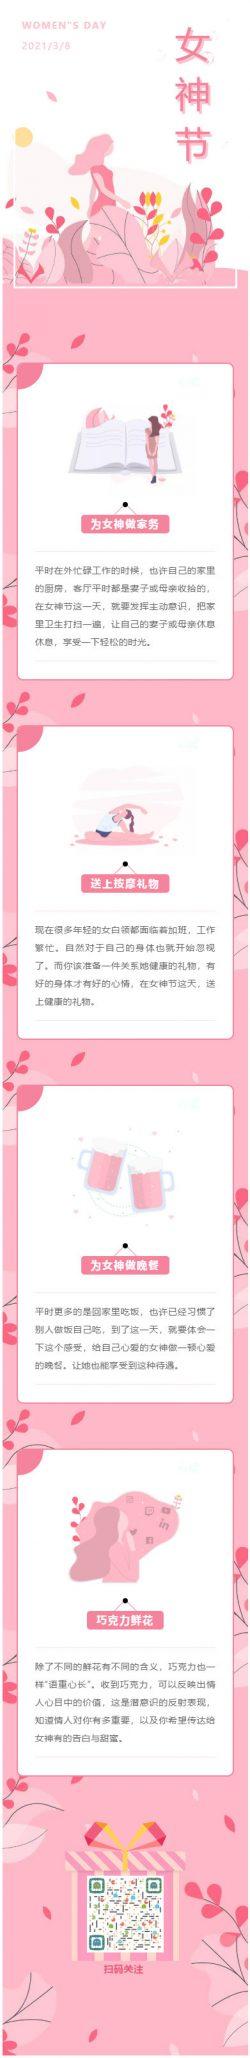 "2021.3.8WOMEN""S DAY女神节模板微信公众号妇女节推送图文模板推文素材"